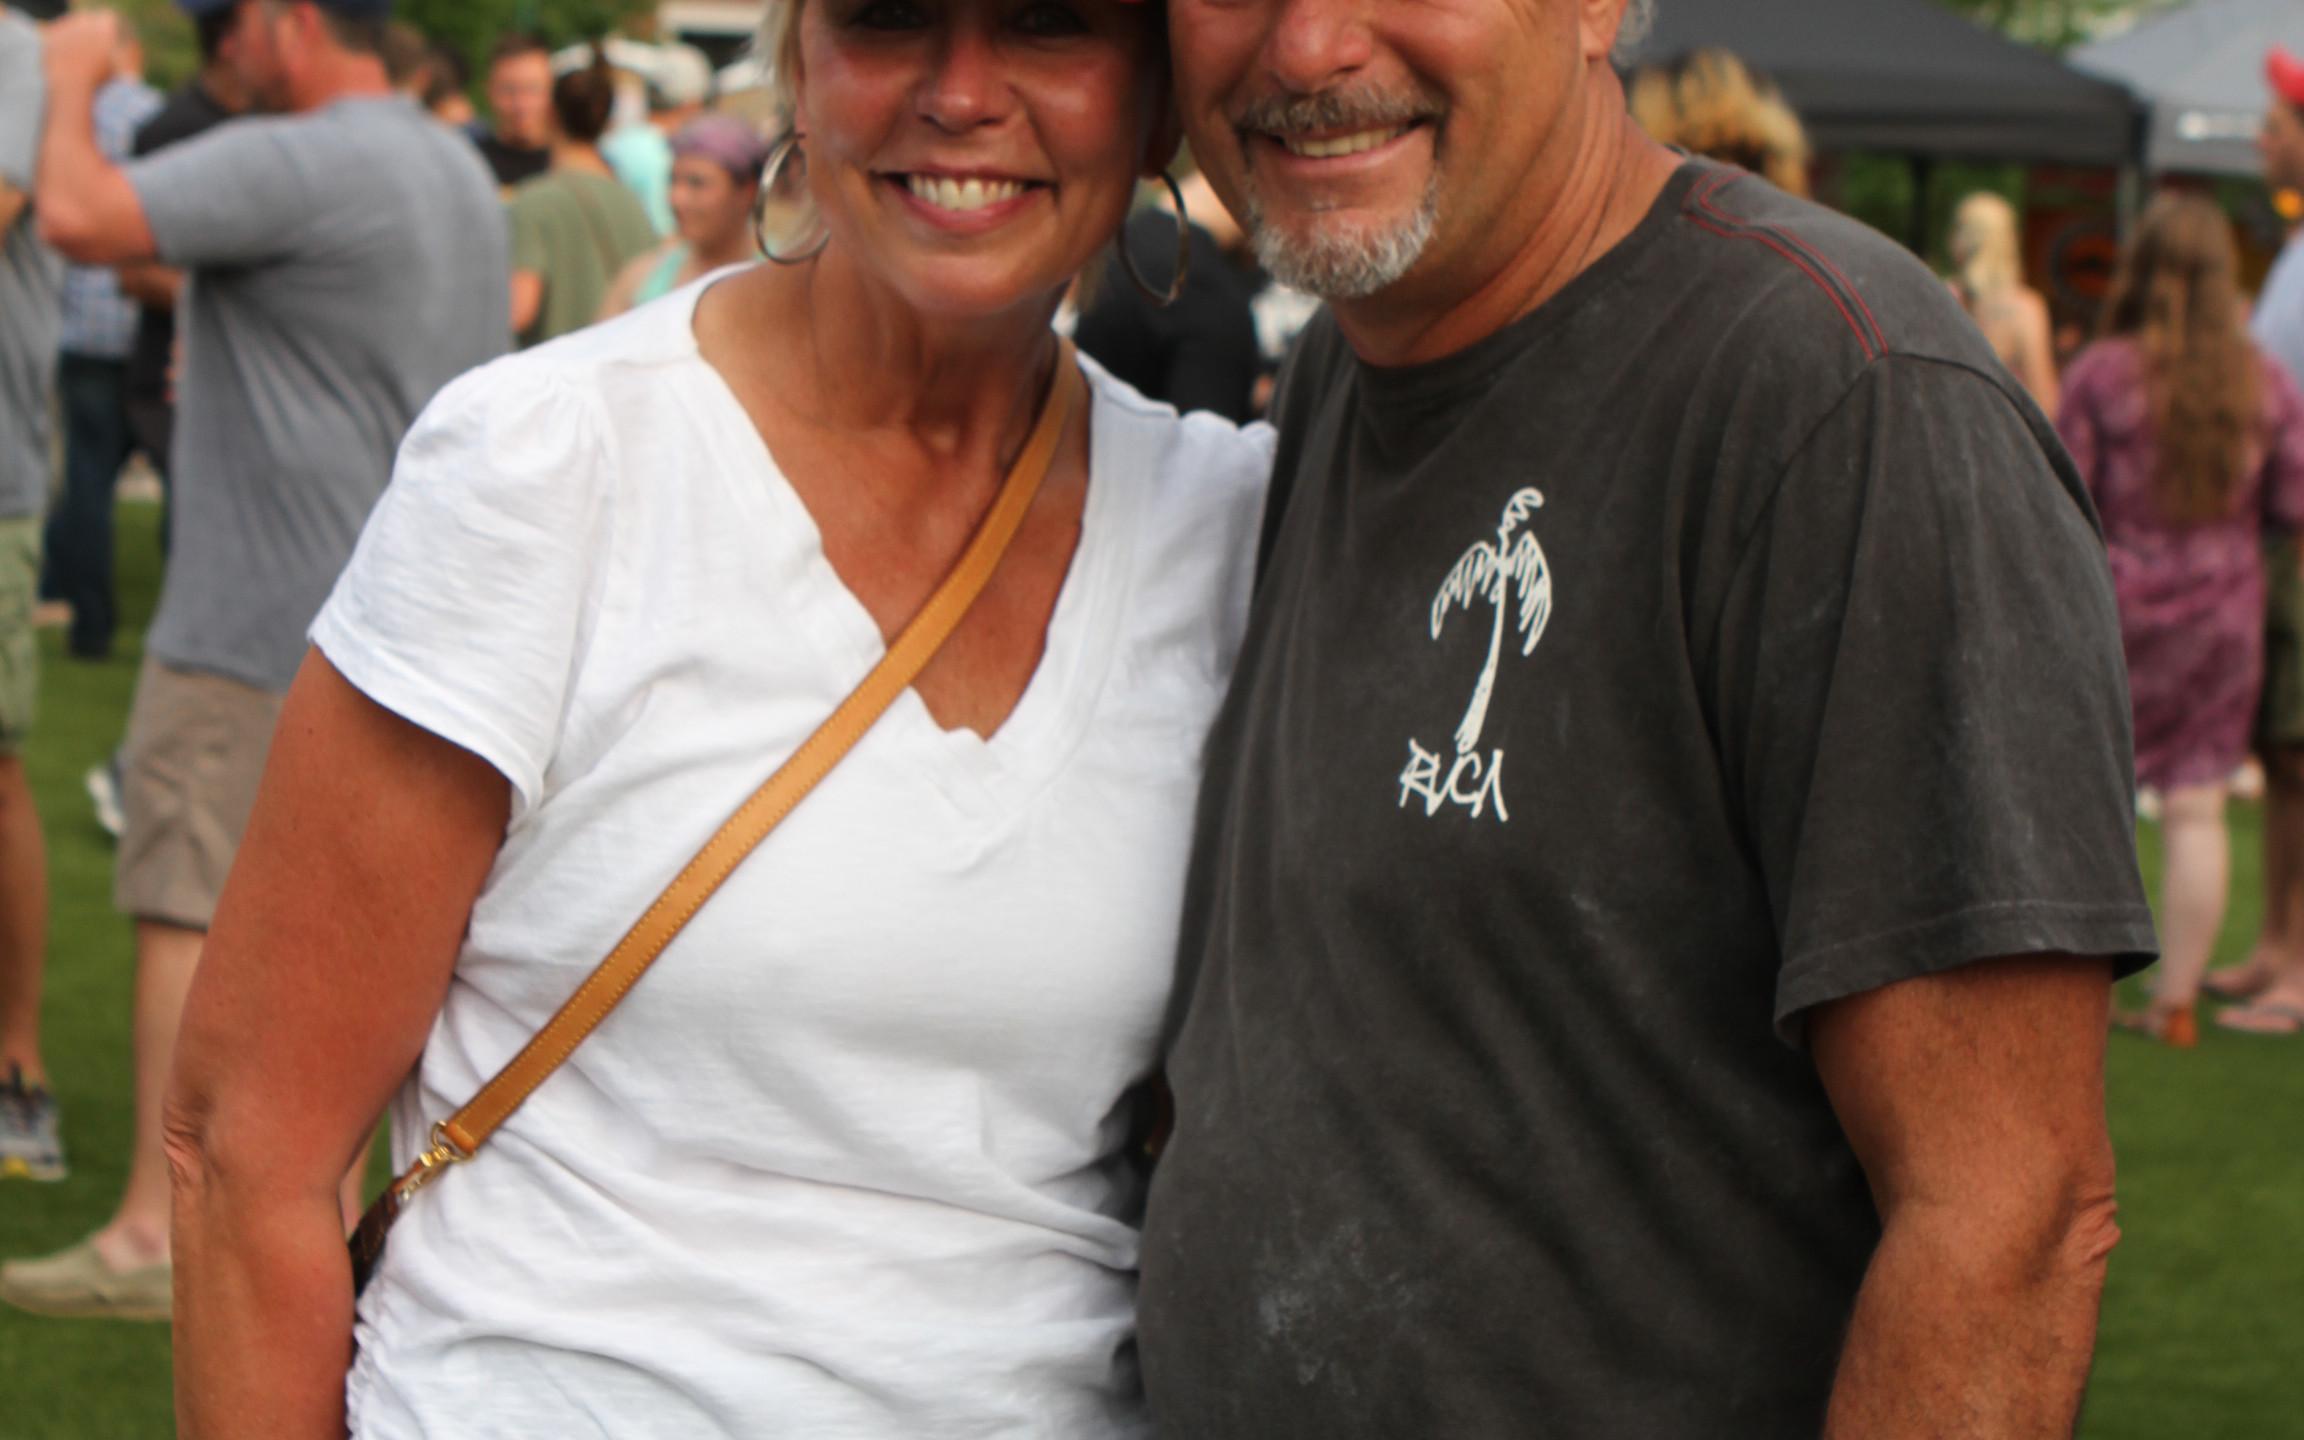 Sarah and Billy Covington